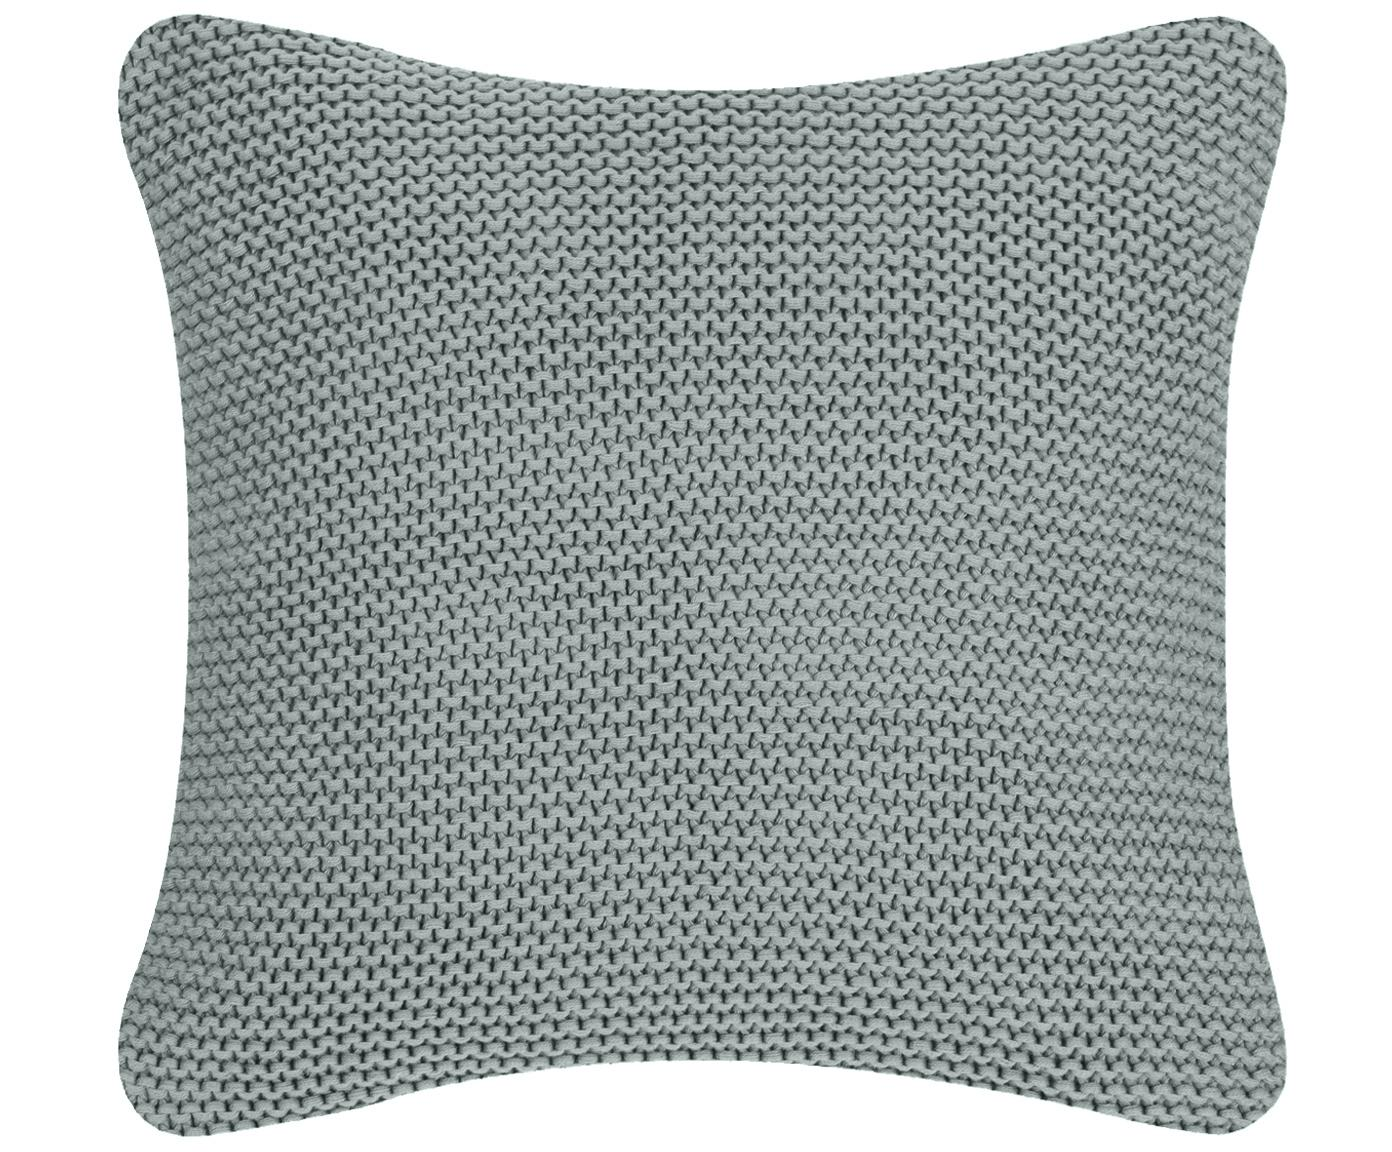 Federa arredo fatta a maglia Adalyn, 100% cotone, Verde salvia, Larg. 50 x Lung. 50 cm